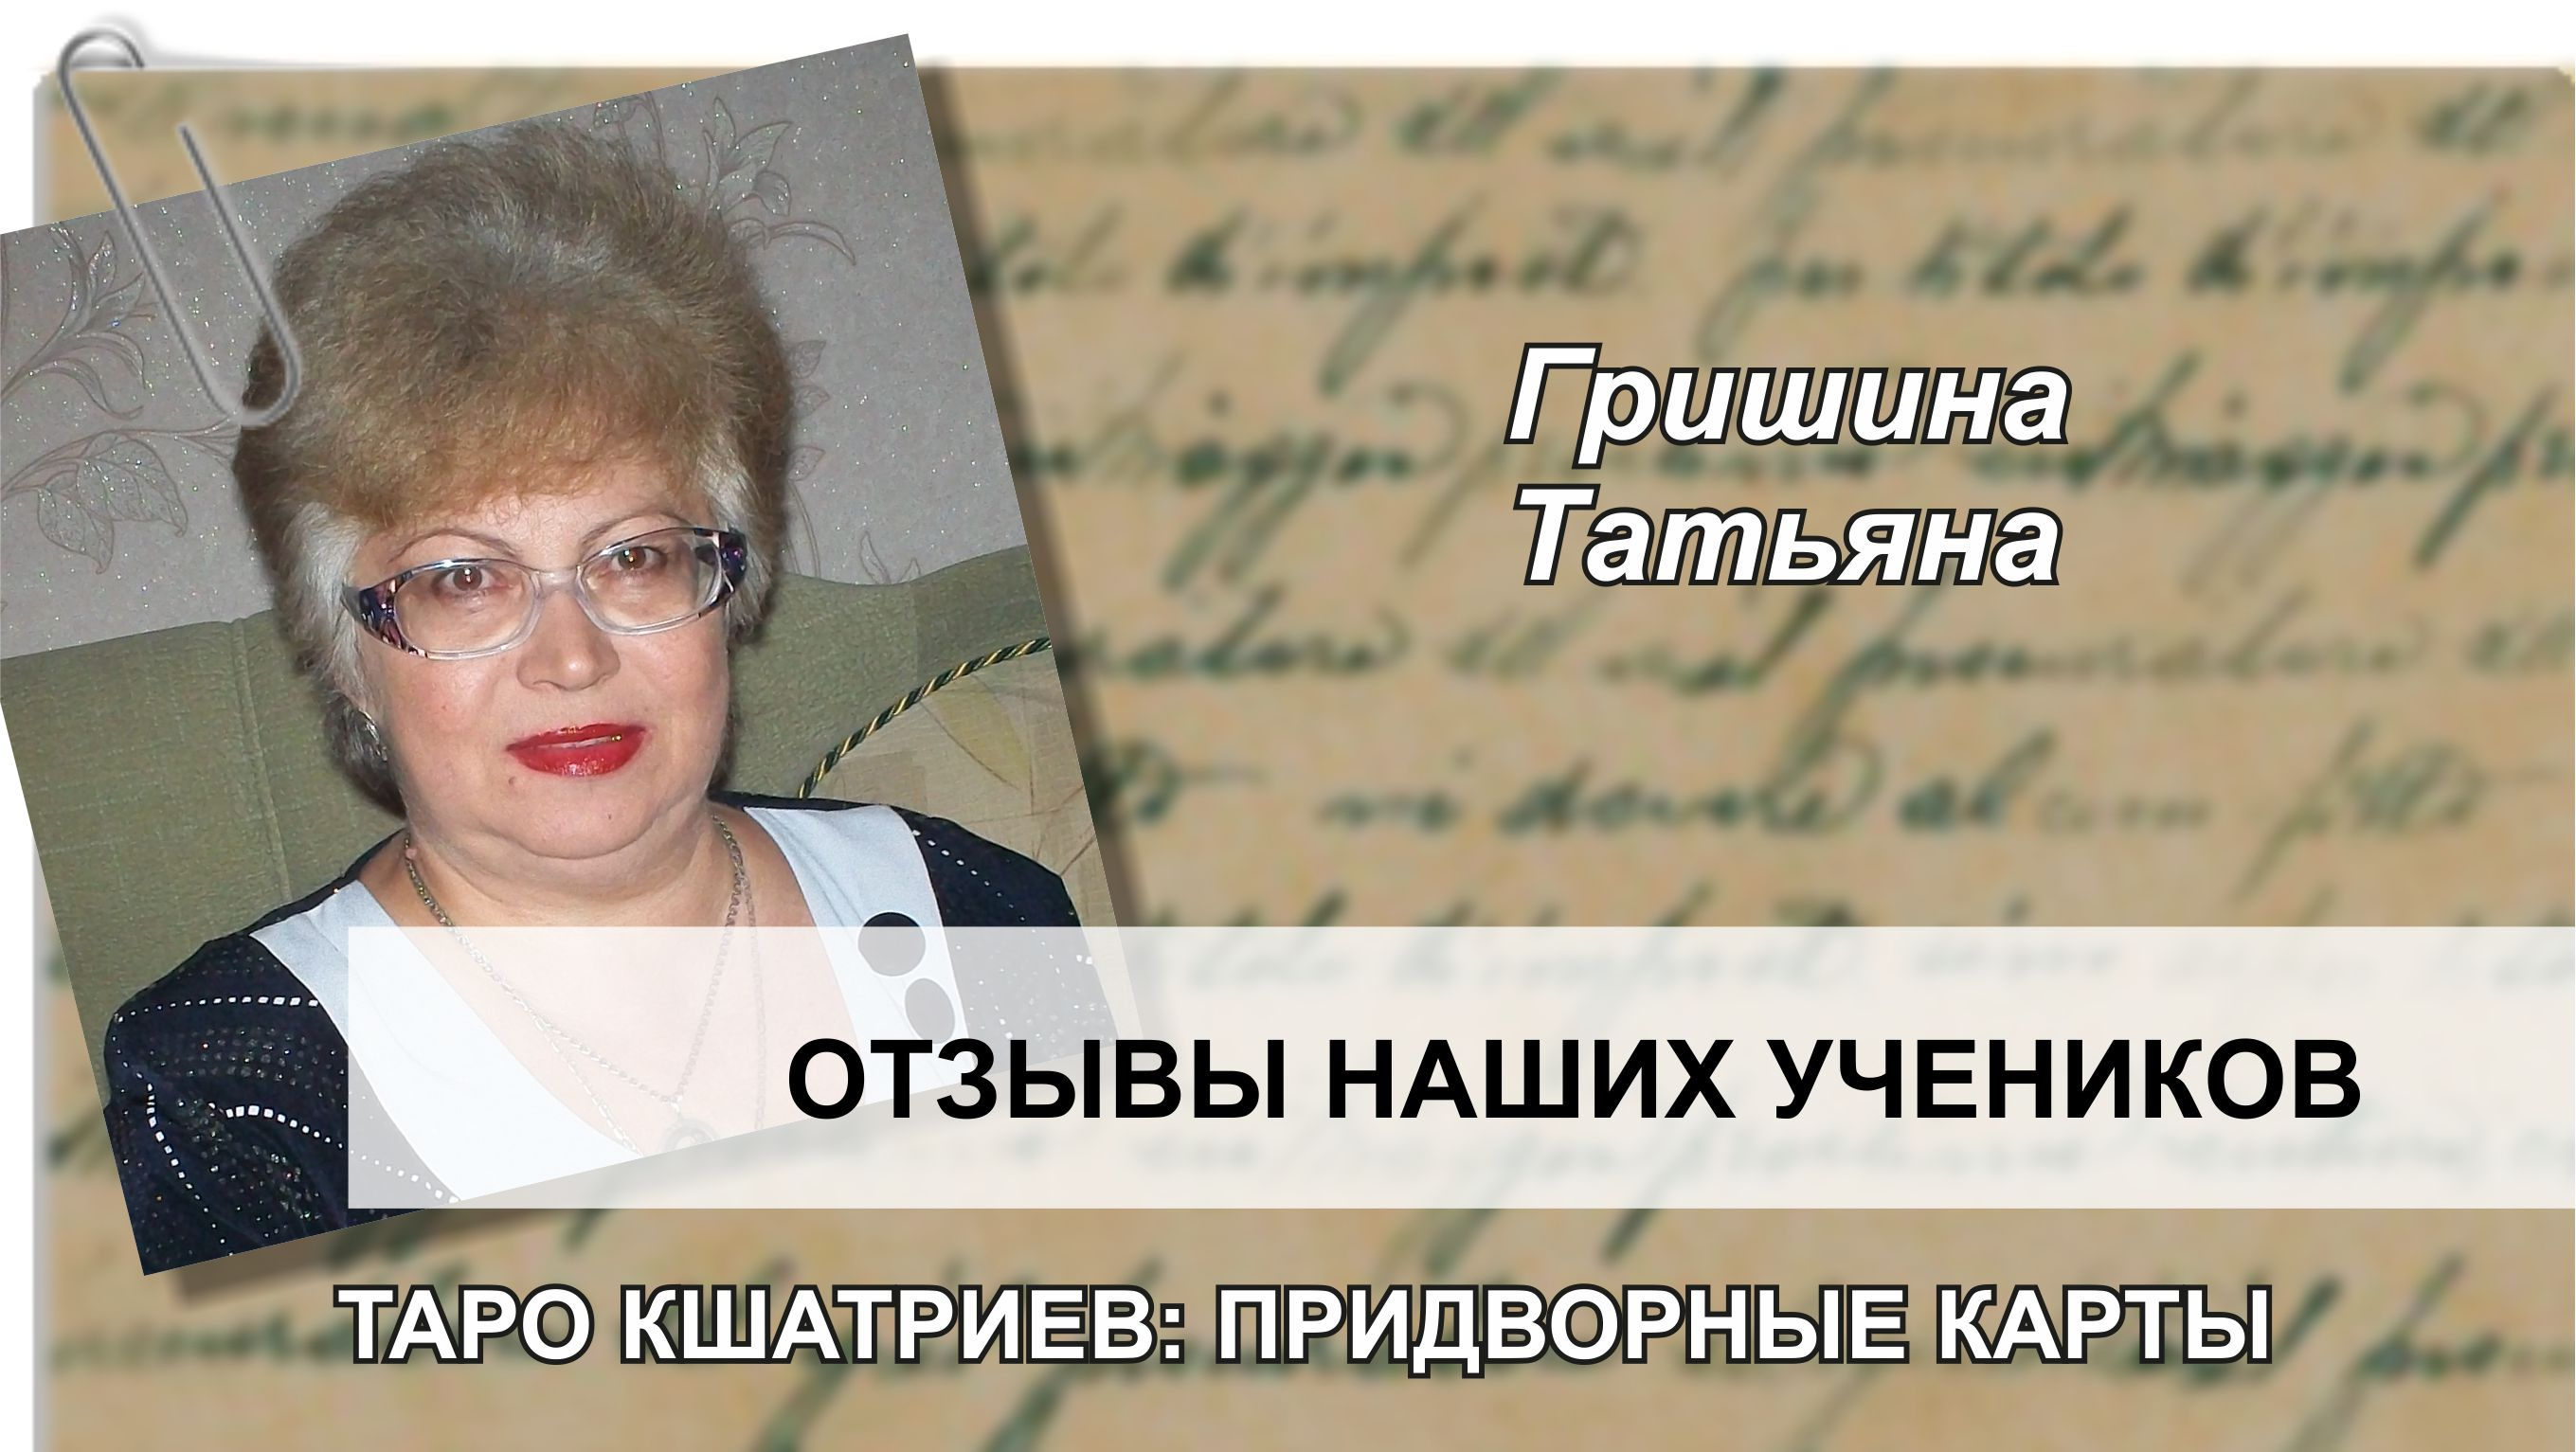 Гришина Татьяна отзыв Таро Кшатриев